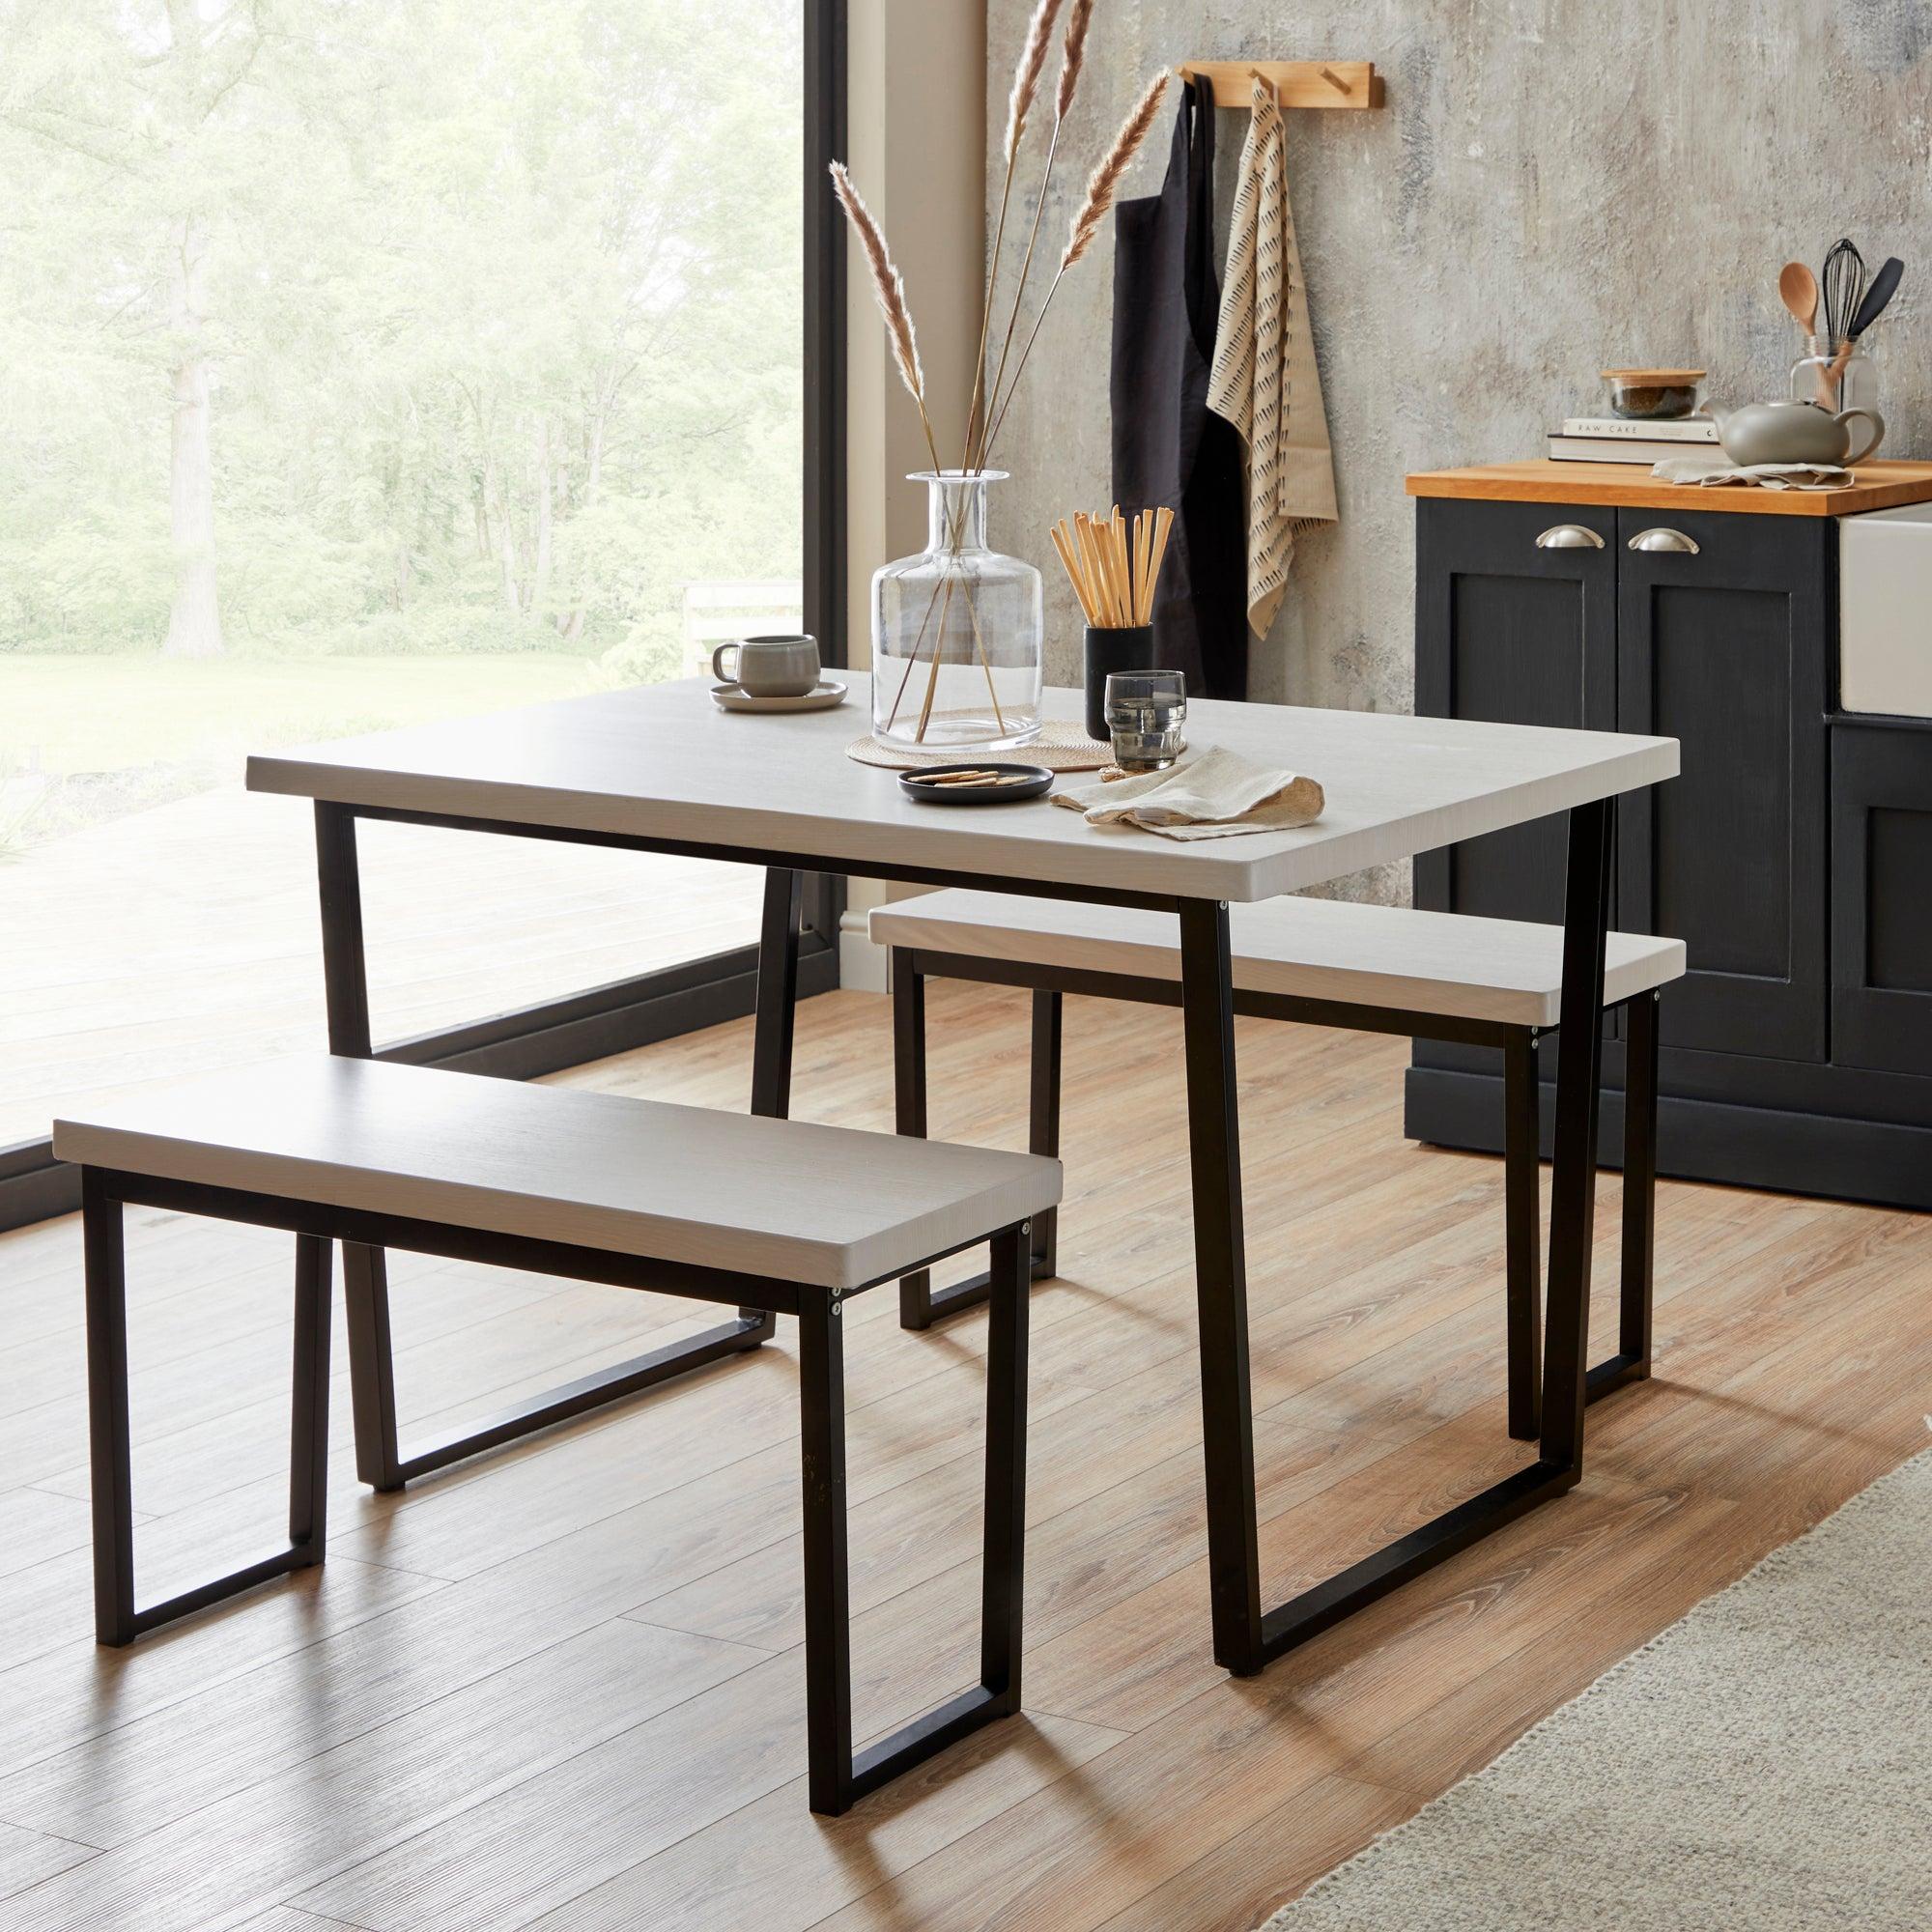 Vixen Rectangular Dining Table Black and white